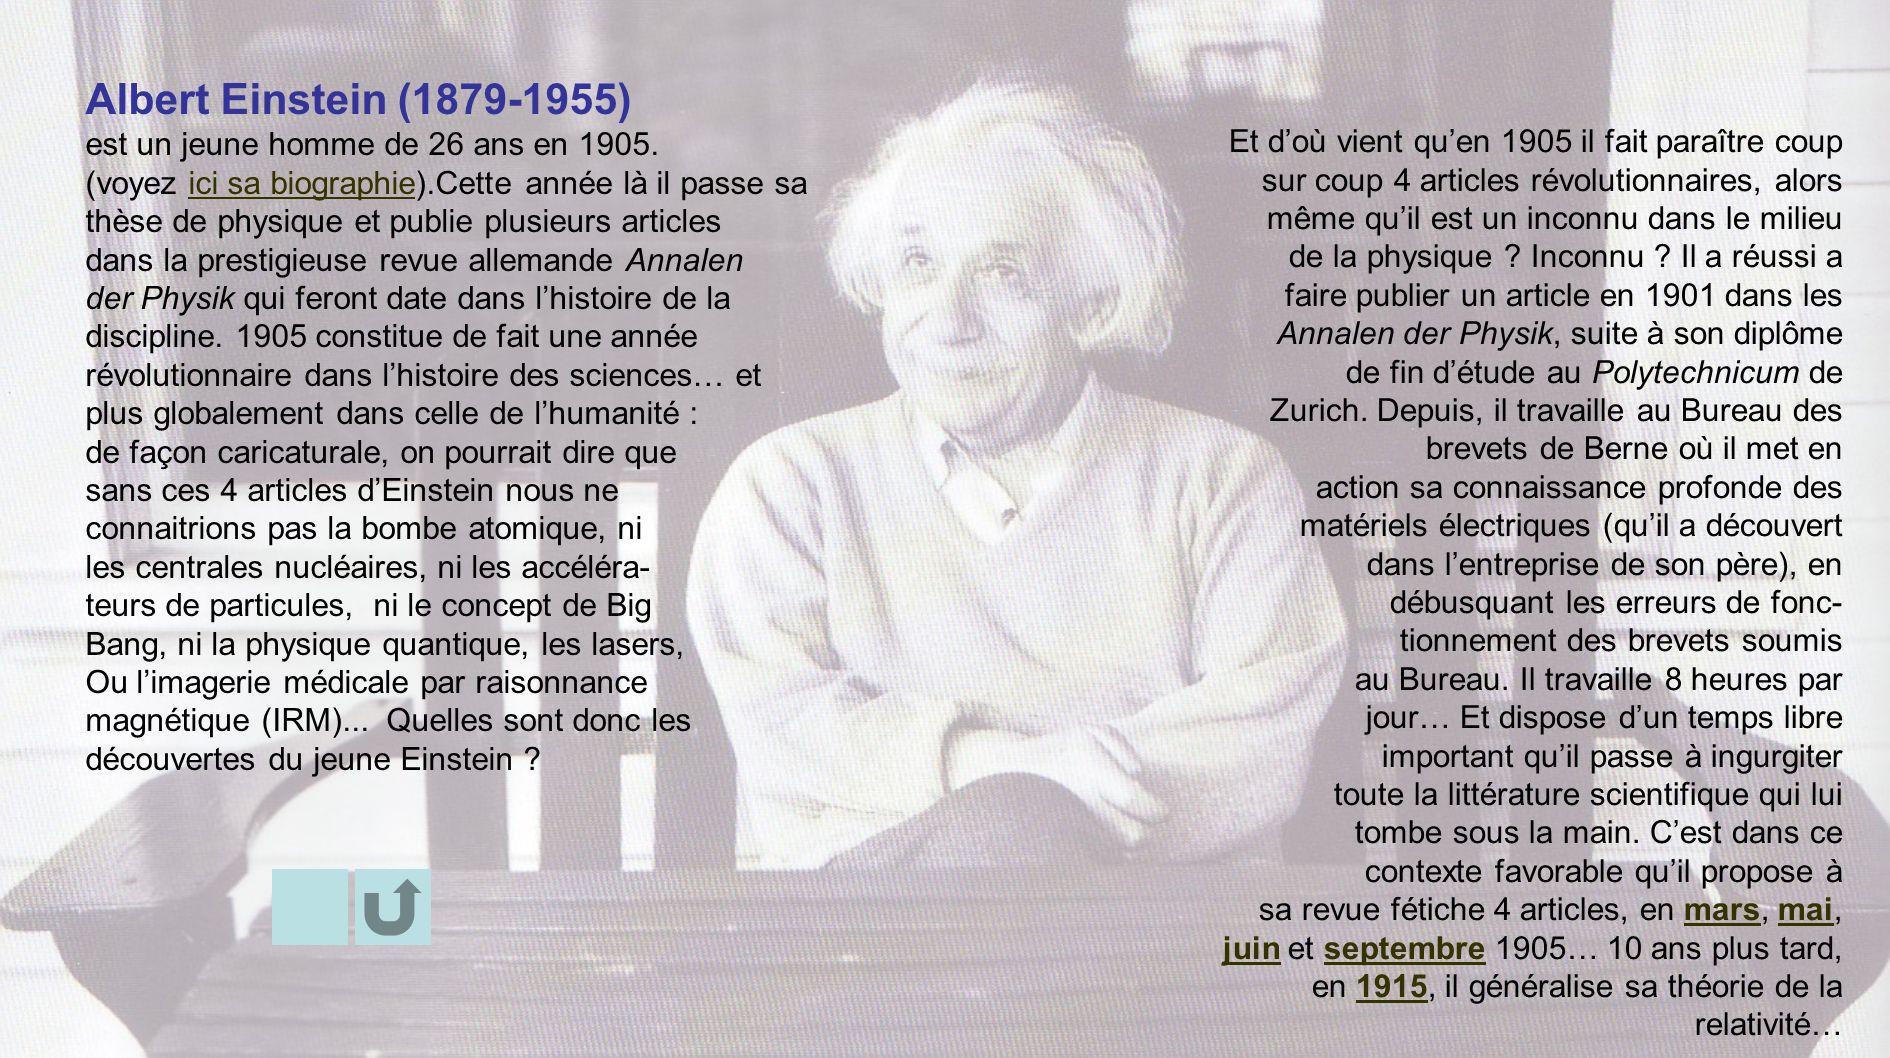 Albert Einstein (1879-1955) est un jeune homme de 26 ans en 1905.